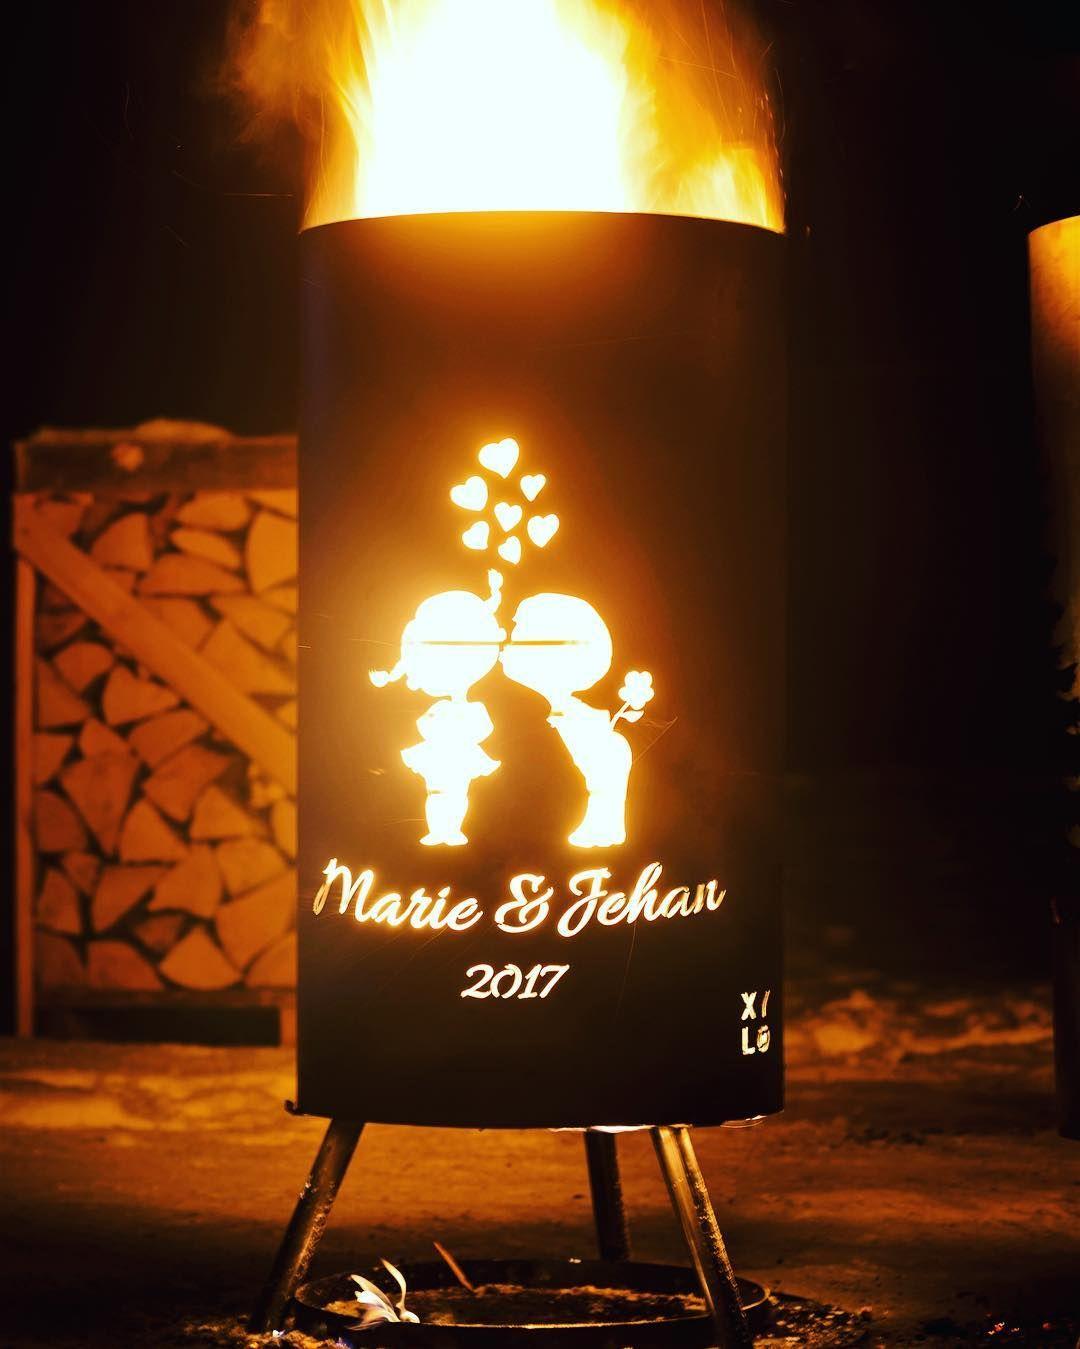 #brasero #xylo #xyloimpact #cadeaudemariage #evenement #wedding #gift #feu #exterieur #personalized #custom #cadeau #love